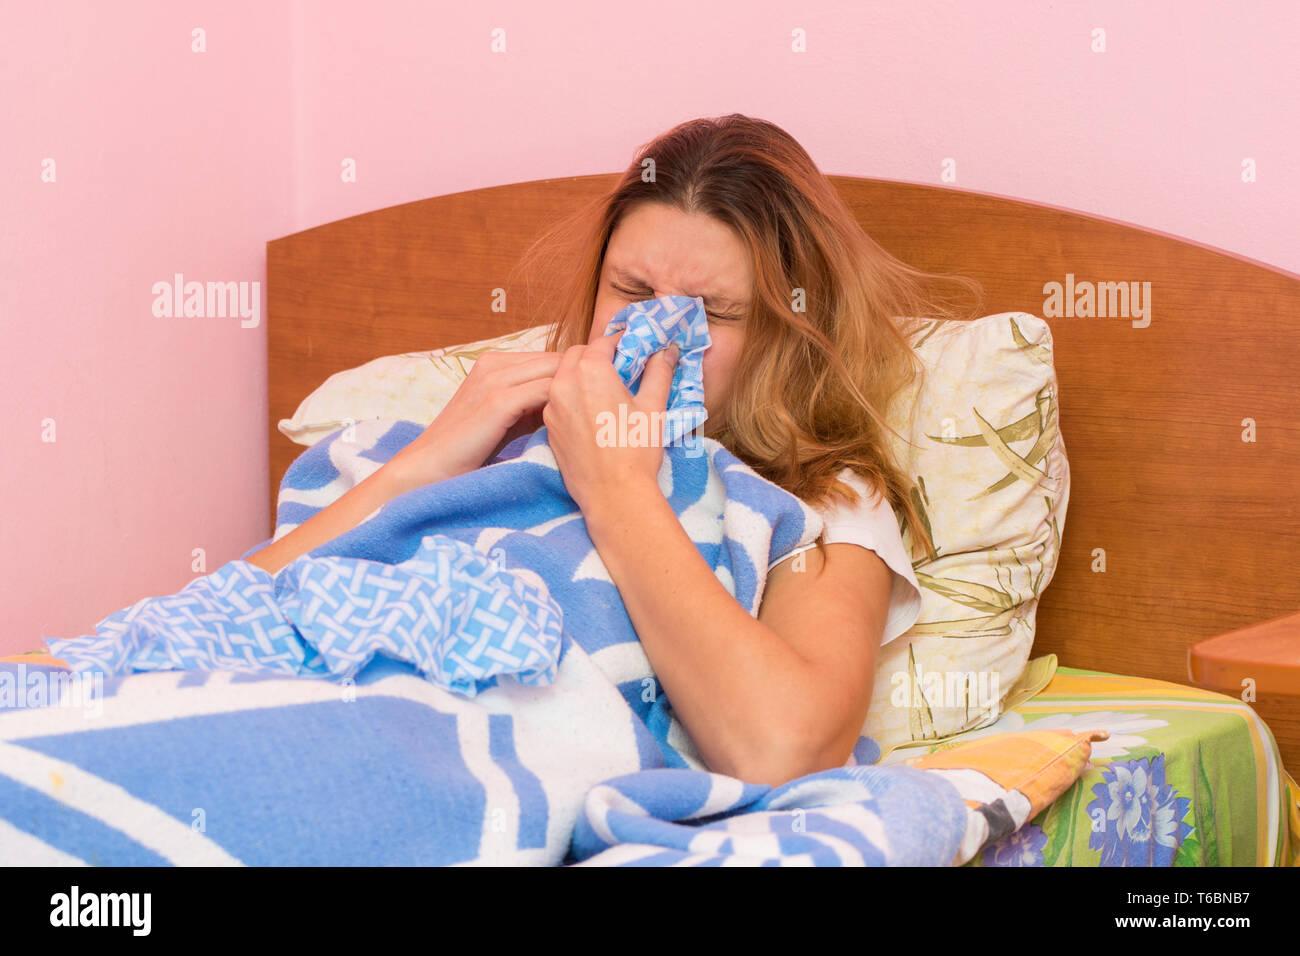 She sneezes ill with acute respiratory illness - Stock Image